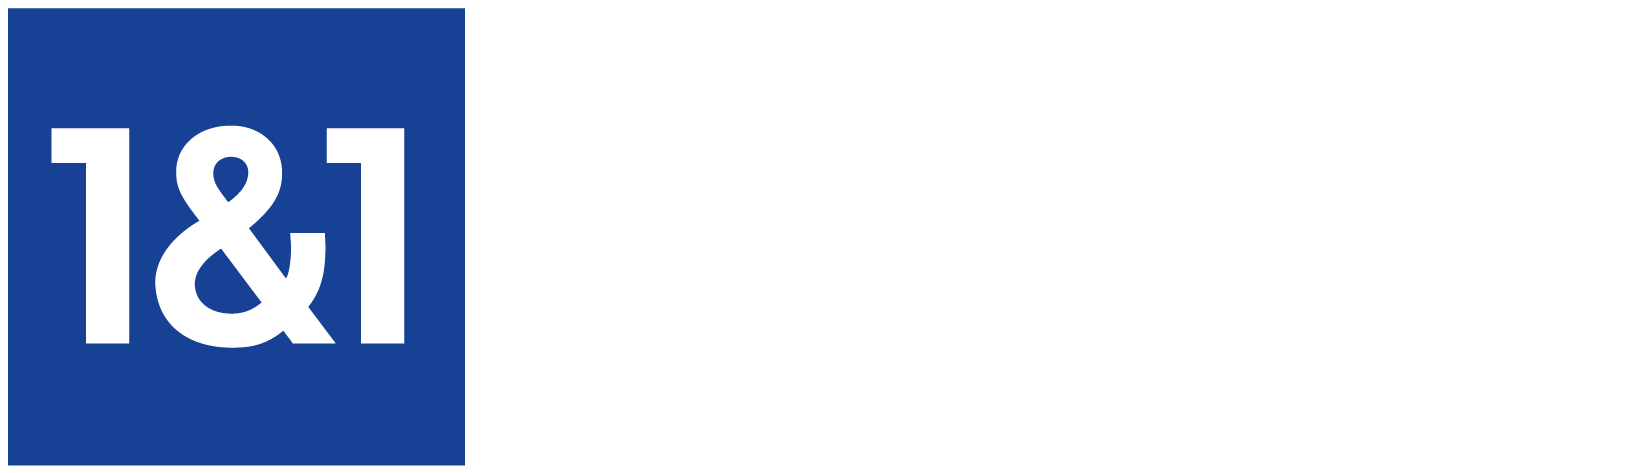 Sauvegarde de site Web Cloud pour IONOS